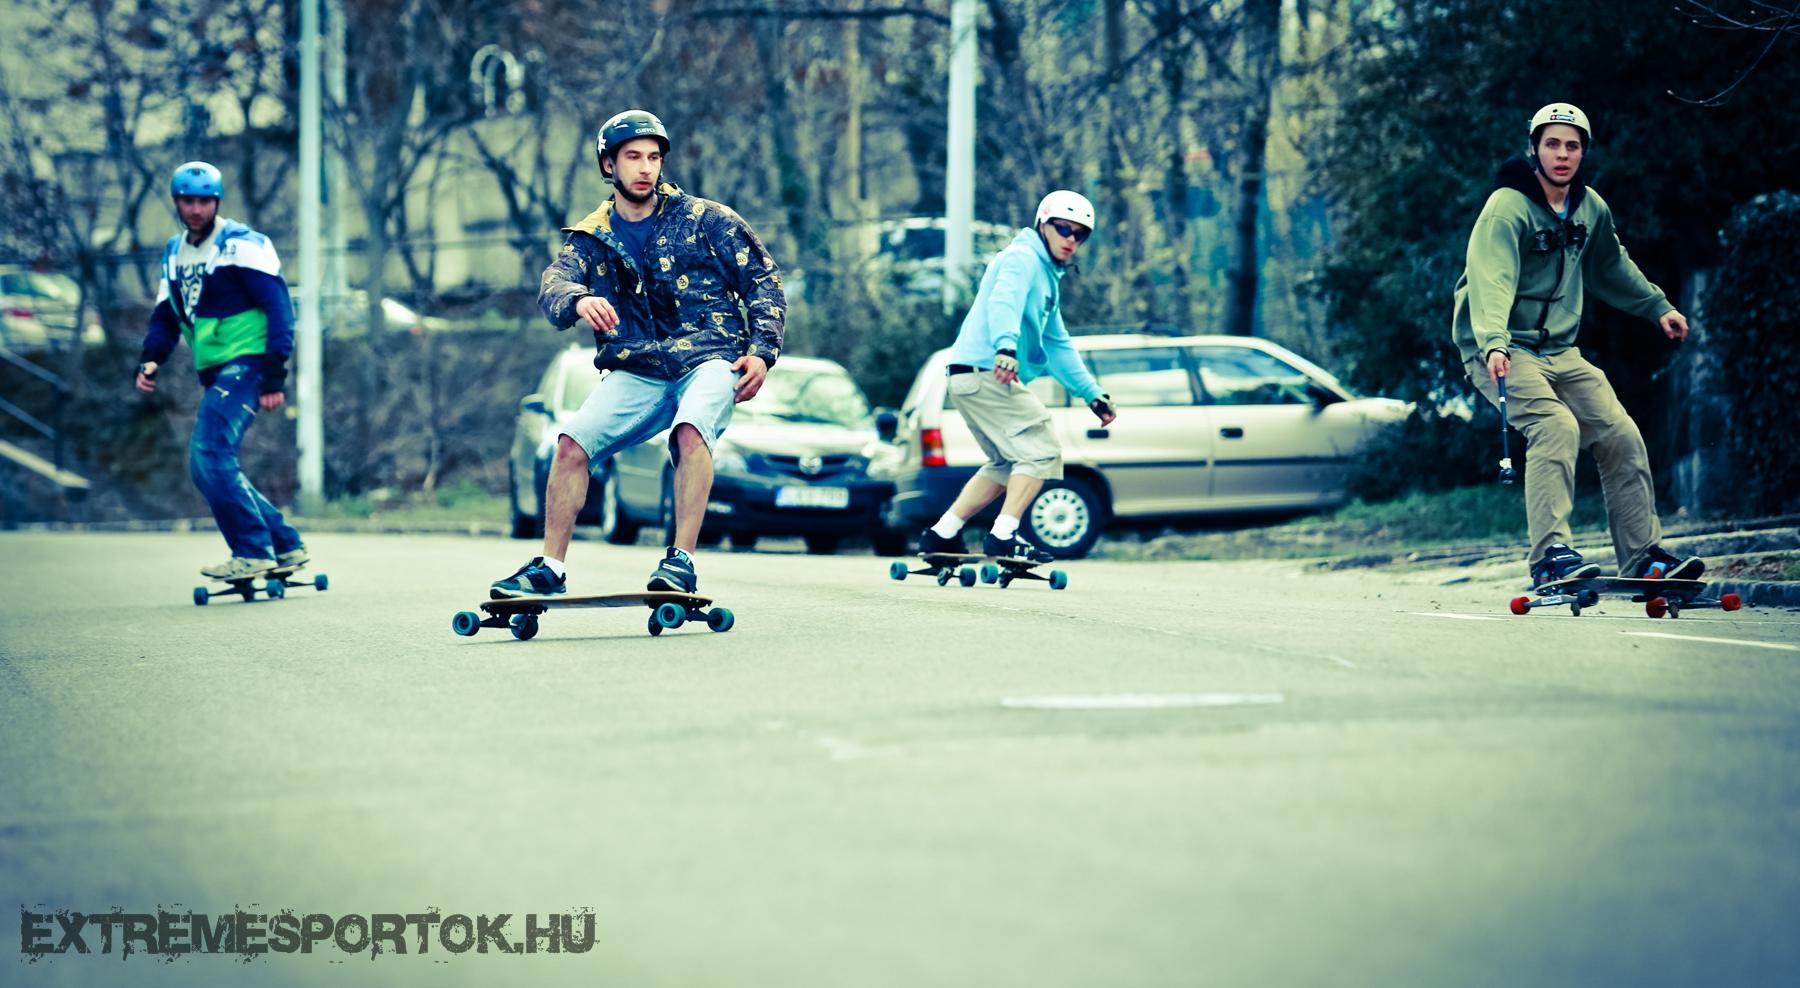 WM_Extremesportok_Freebord_poland_Myactioncam_Drift_Ghost_Budapest_m201.jpg